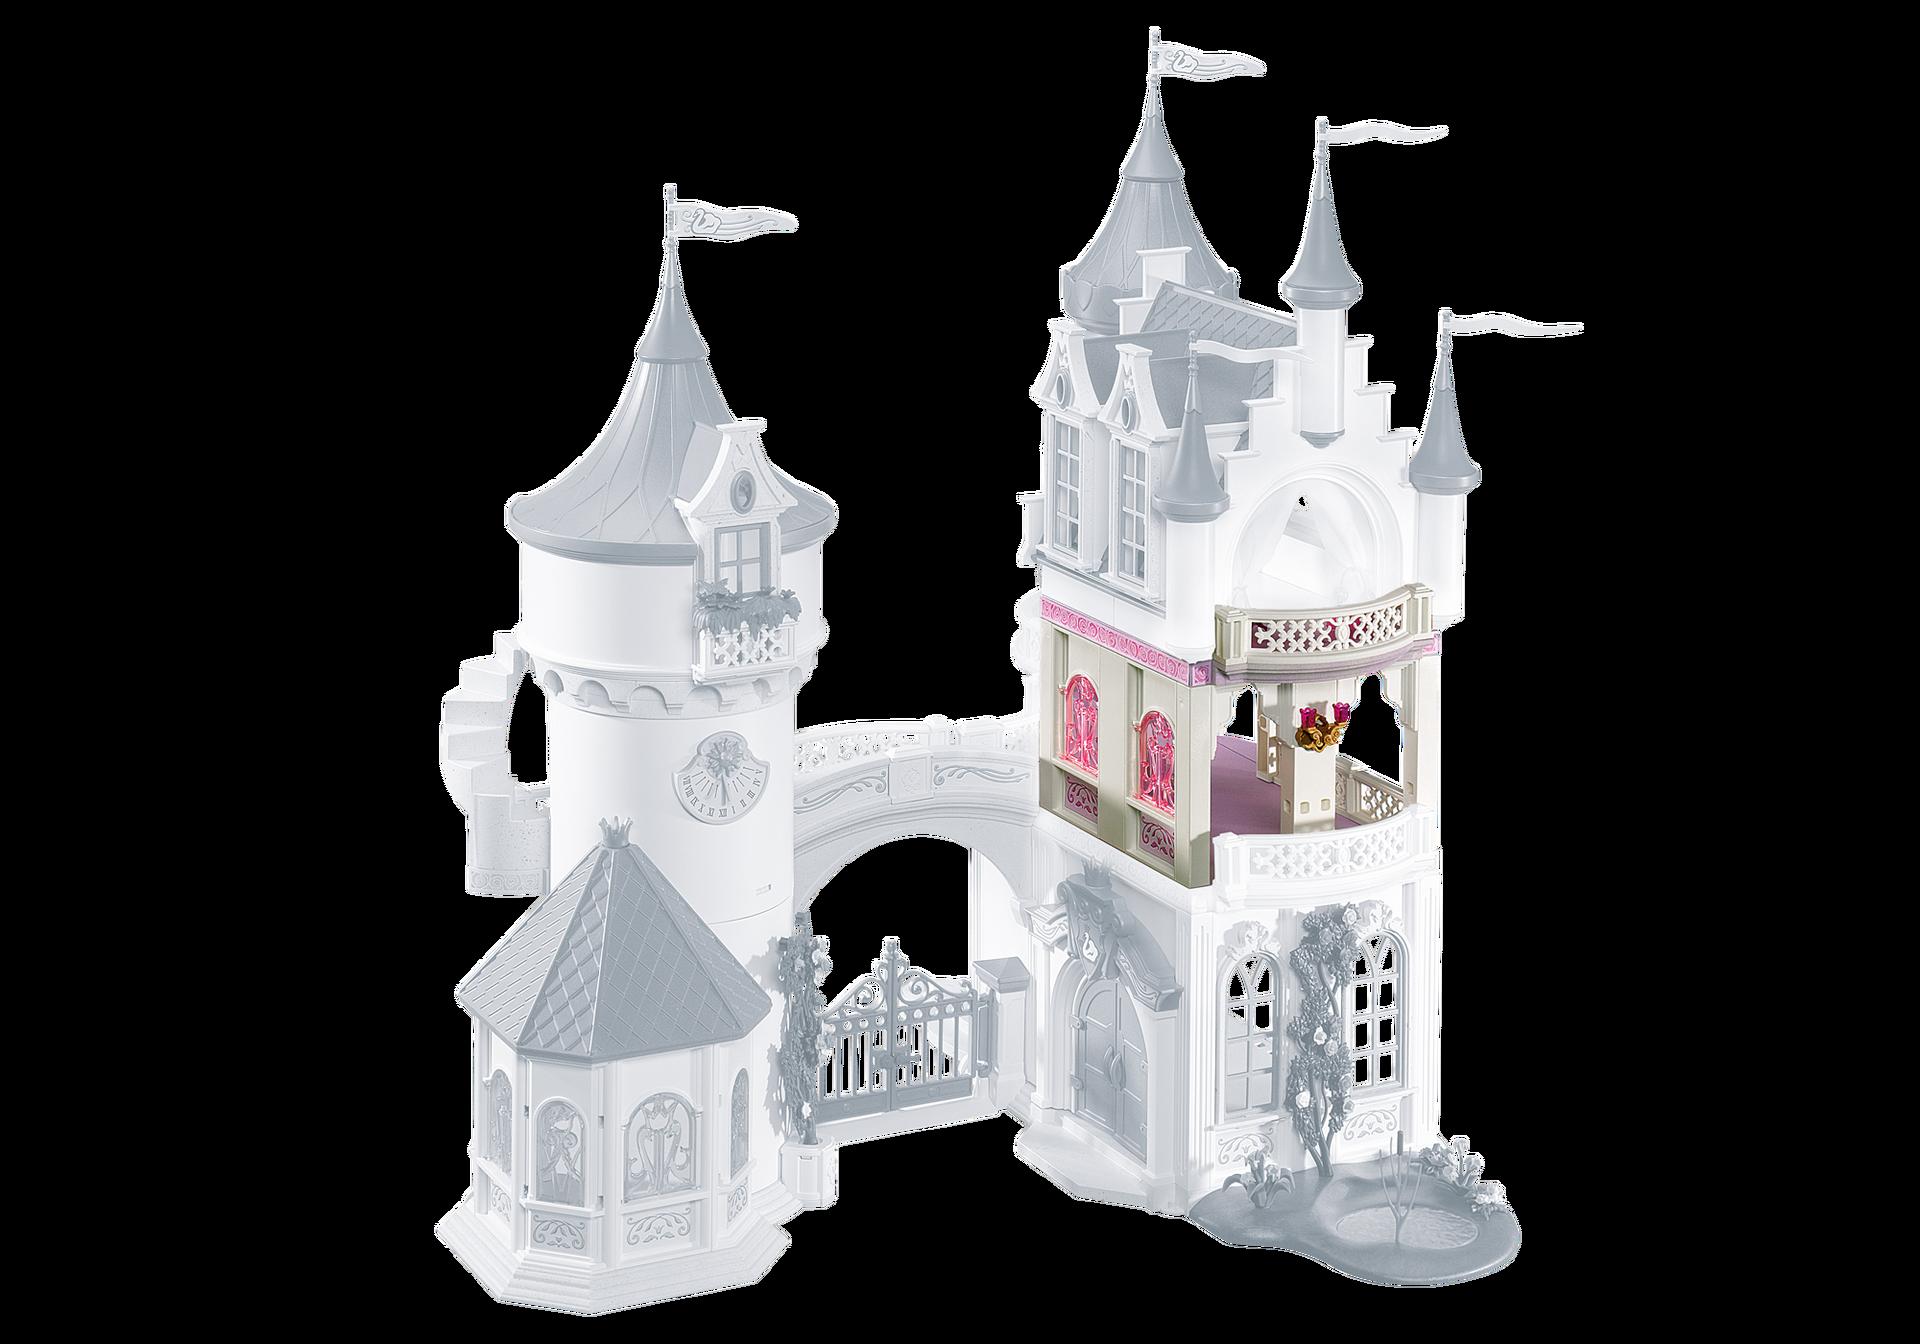 Extension for princess fantasy castle 5142 6236 for Chateau princesse playmobil 5142